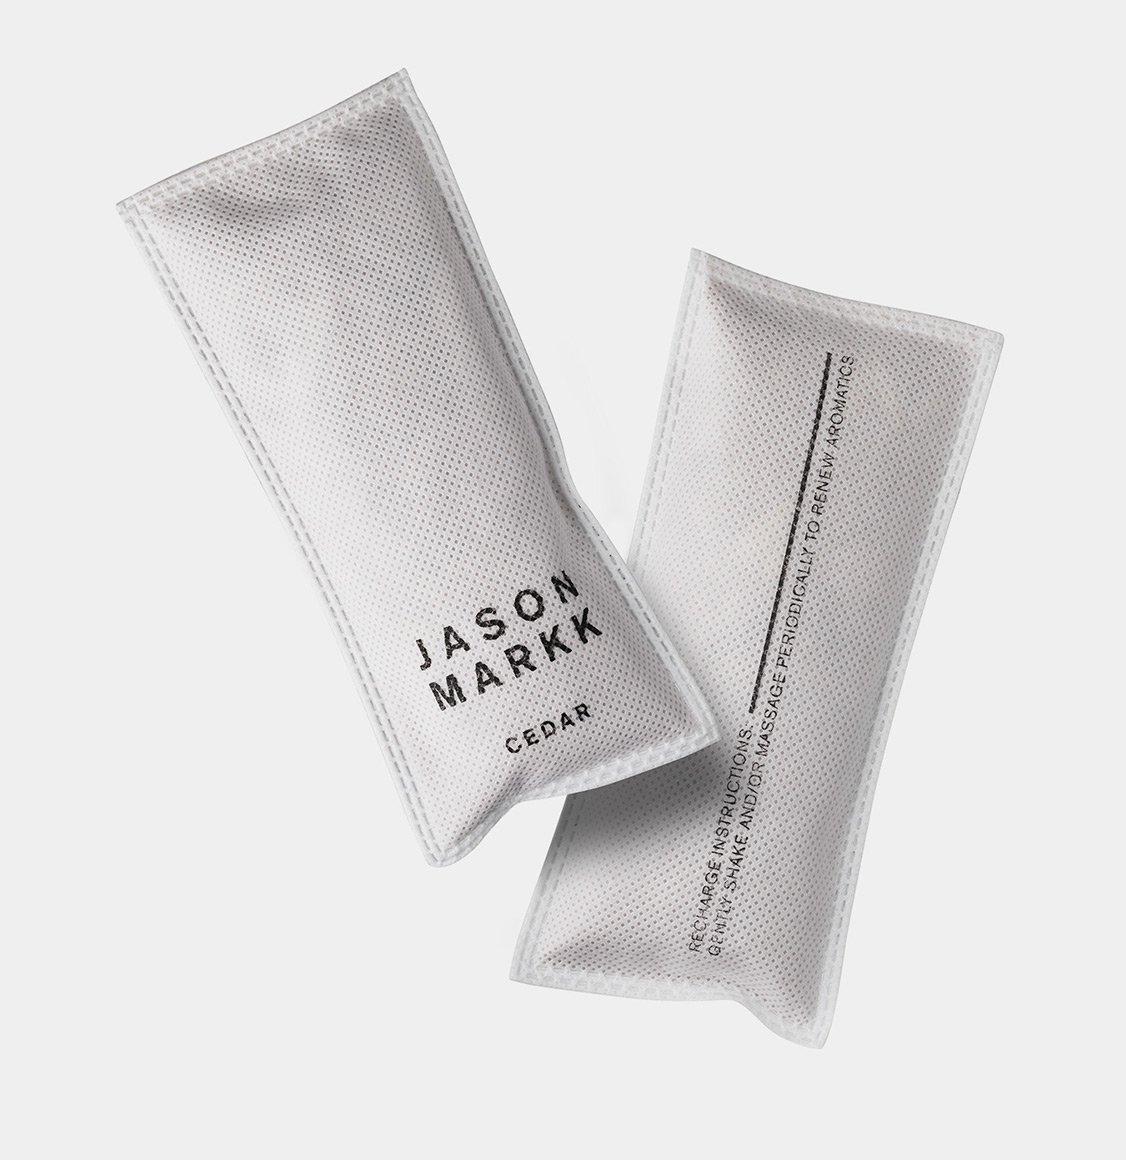 Jason Markk Daily Shoe Care Kit